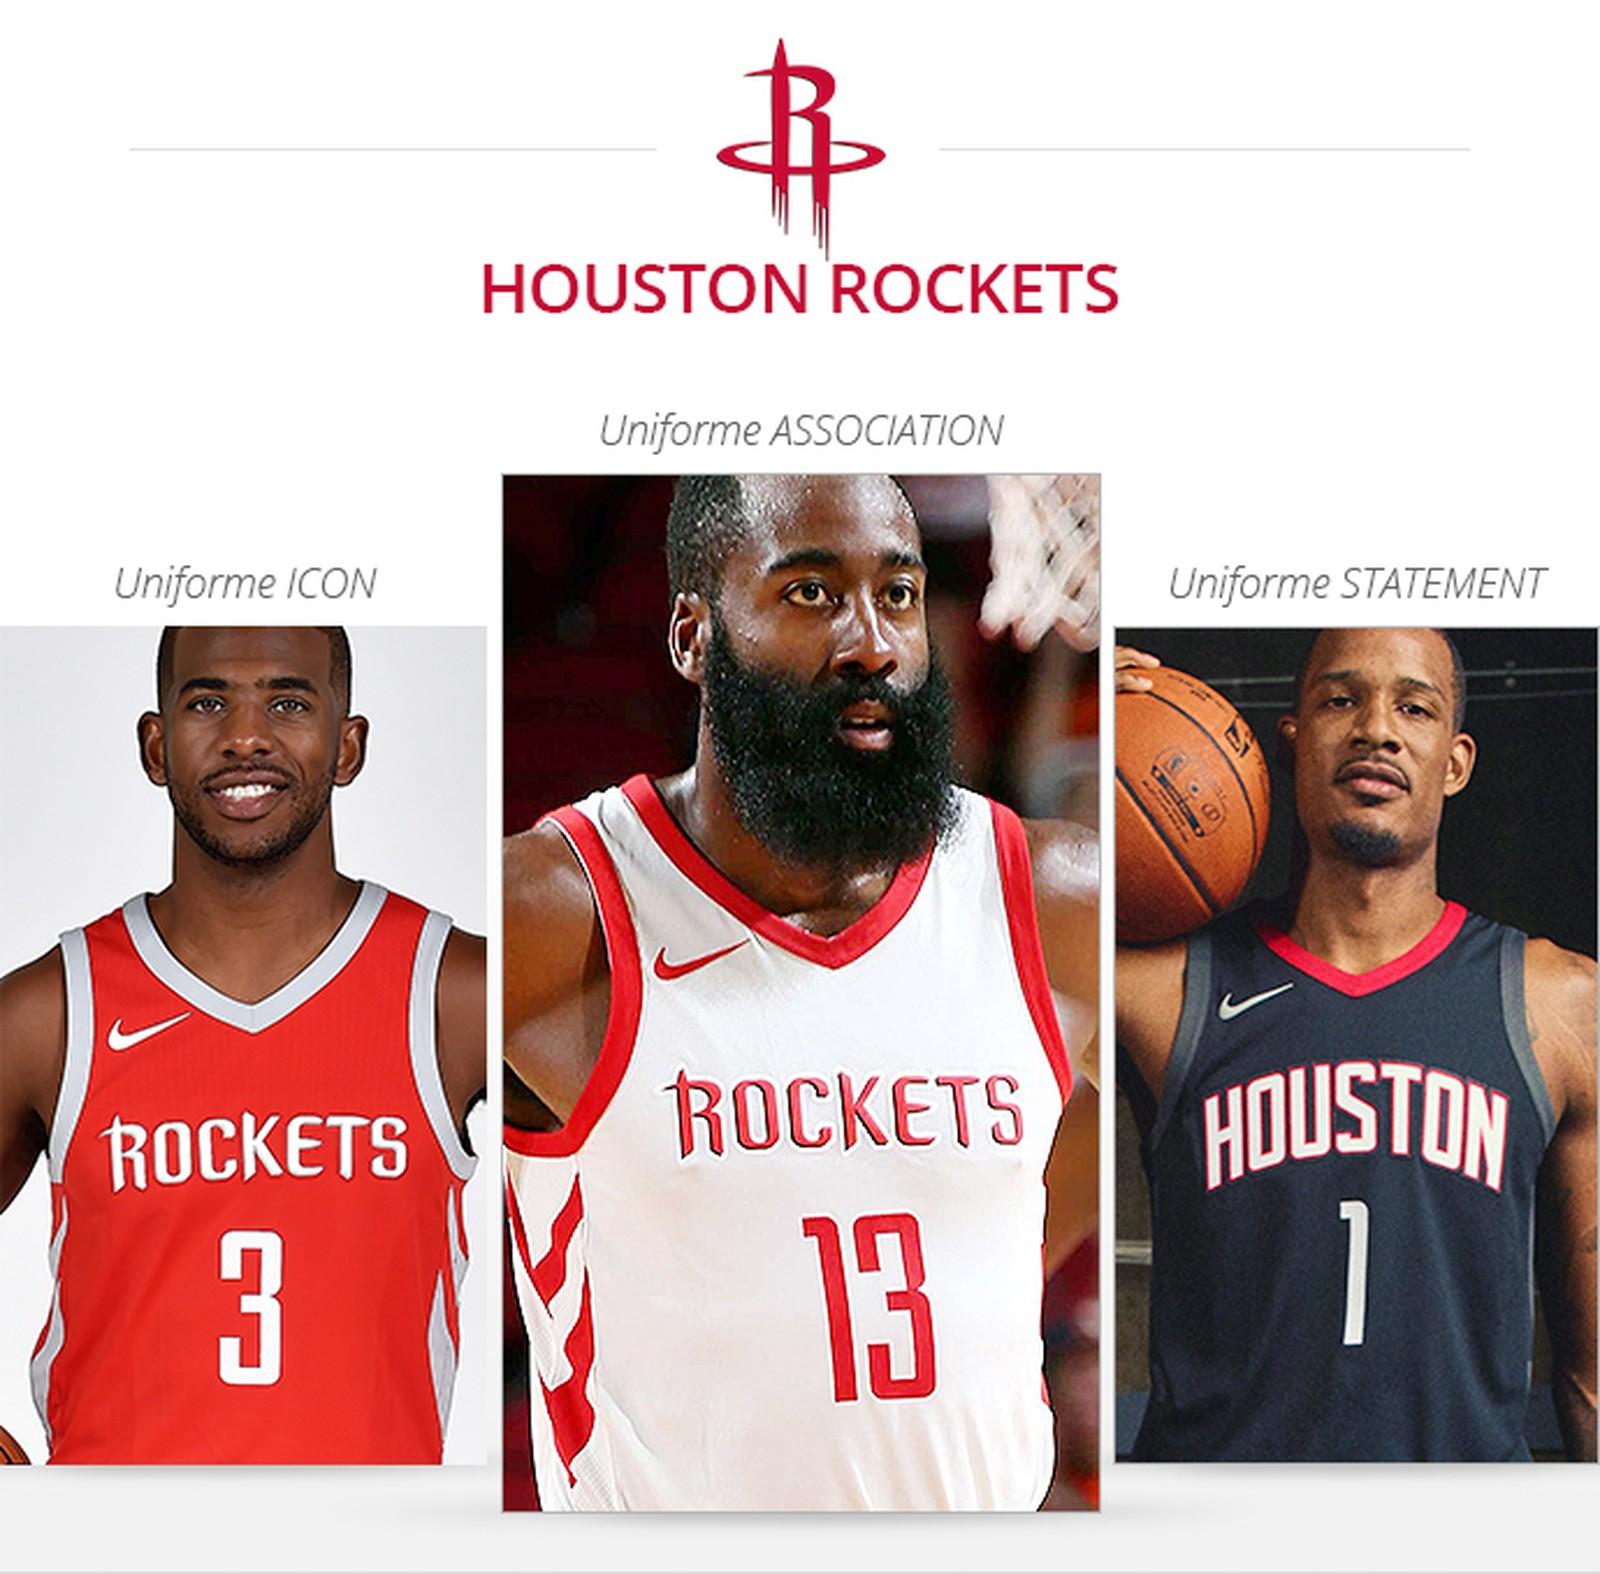 Uniformes Houston Rockets 2017/18